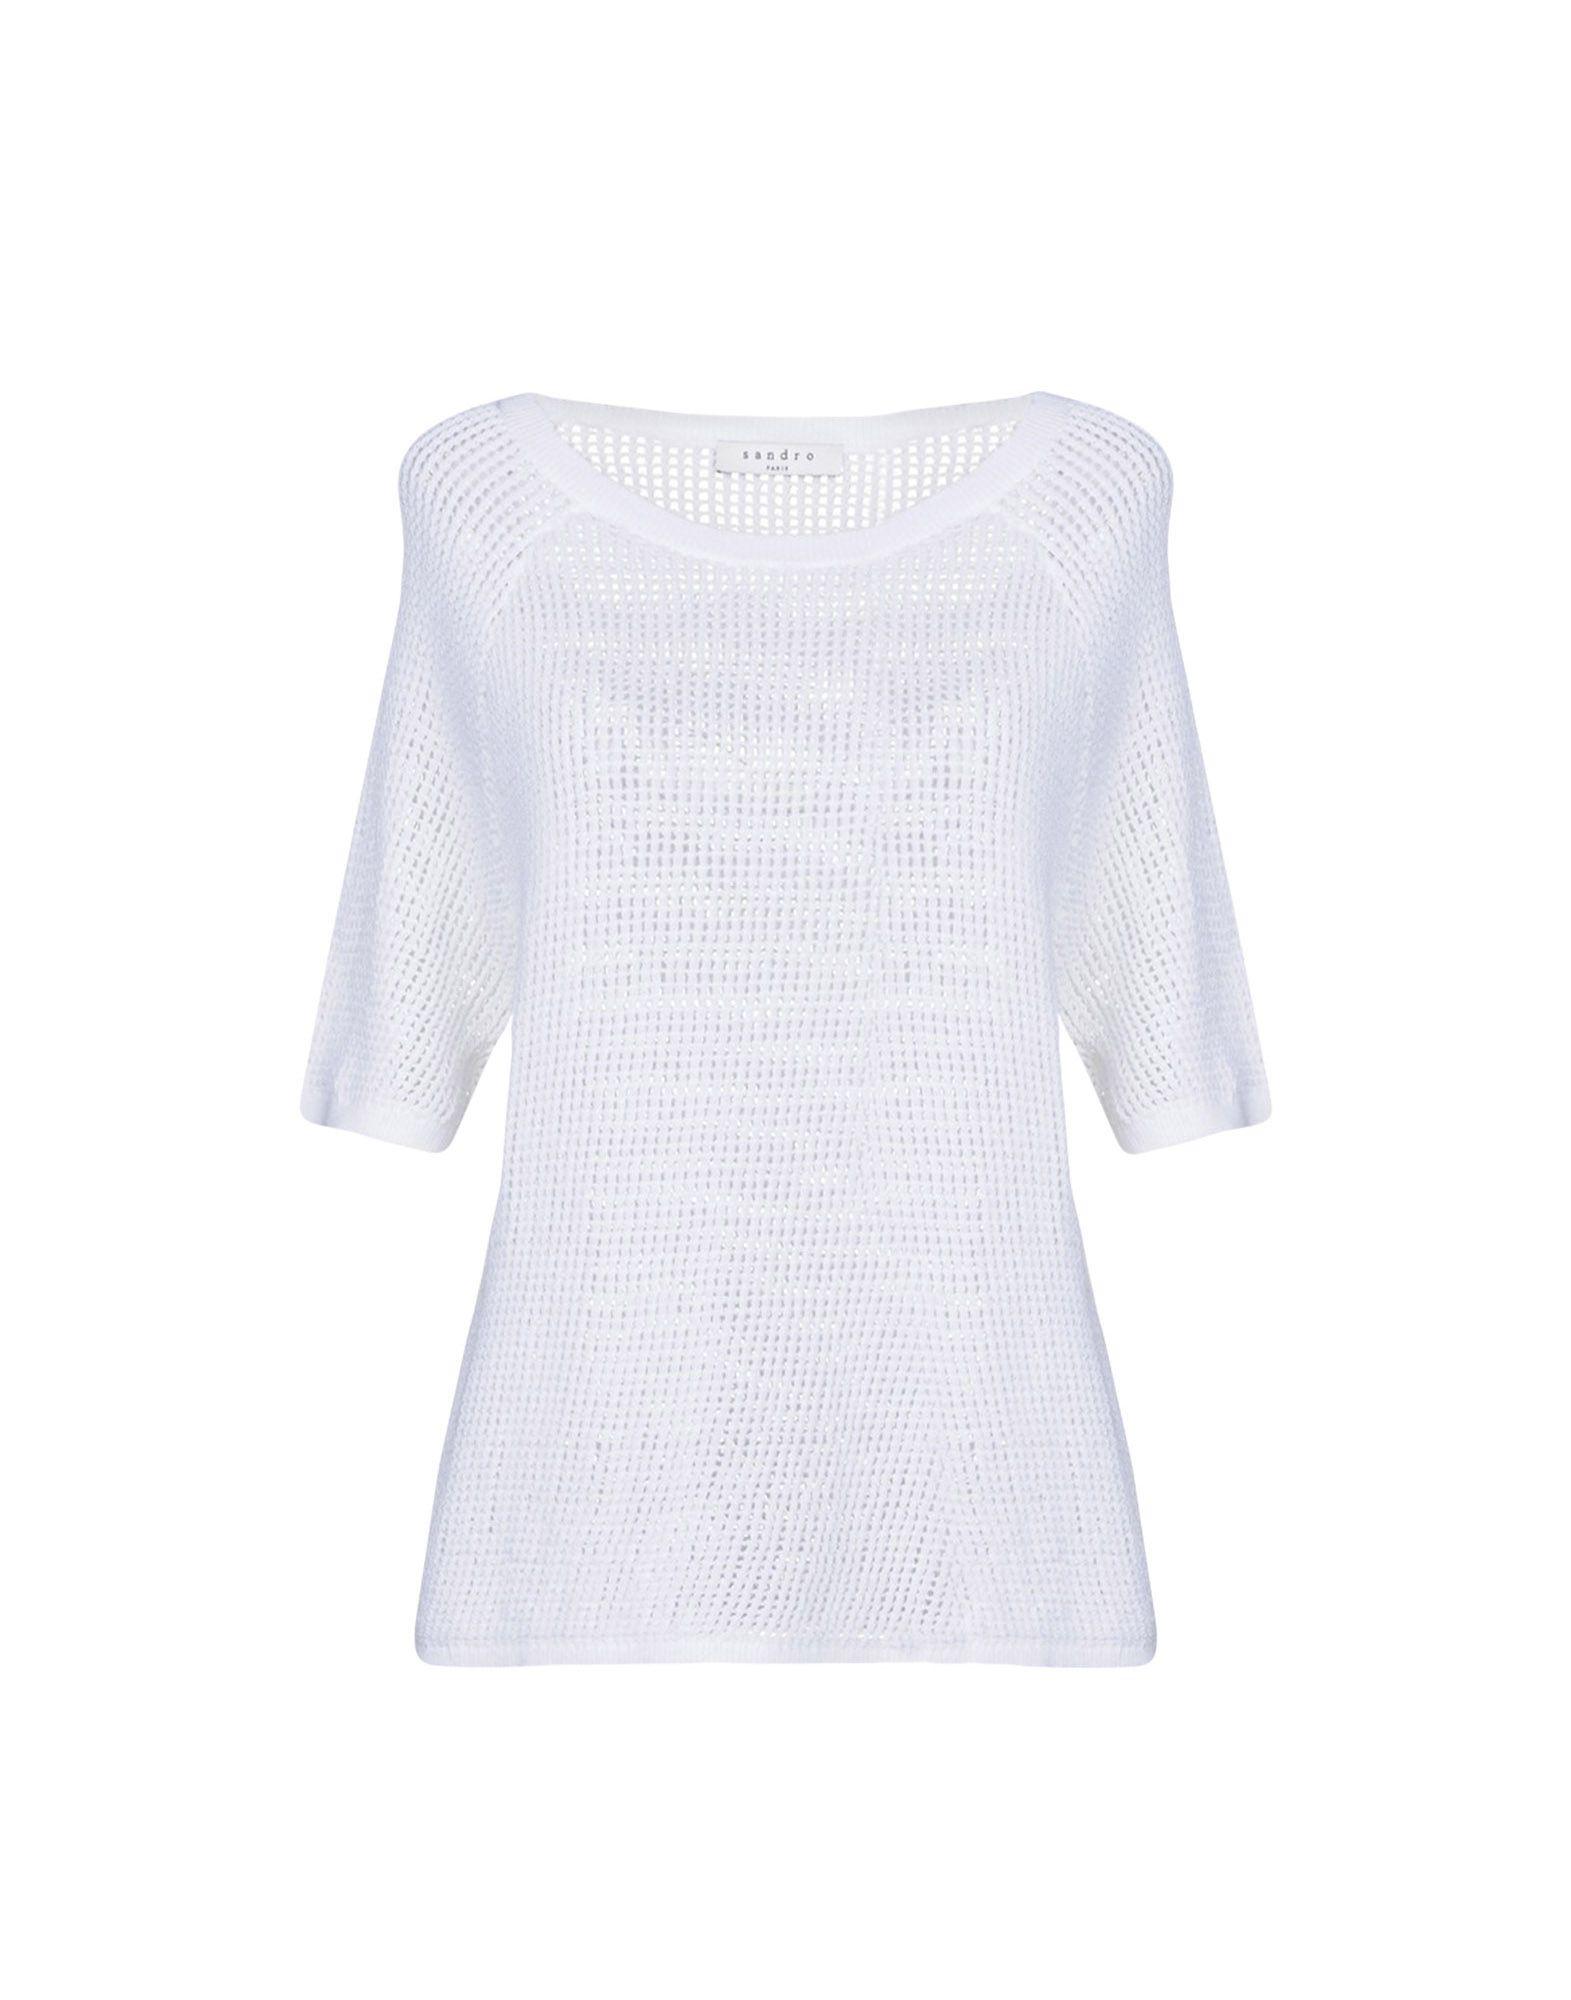 SANDRO PARIS Sweater in White